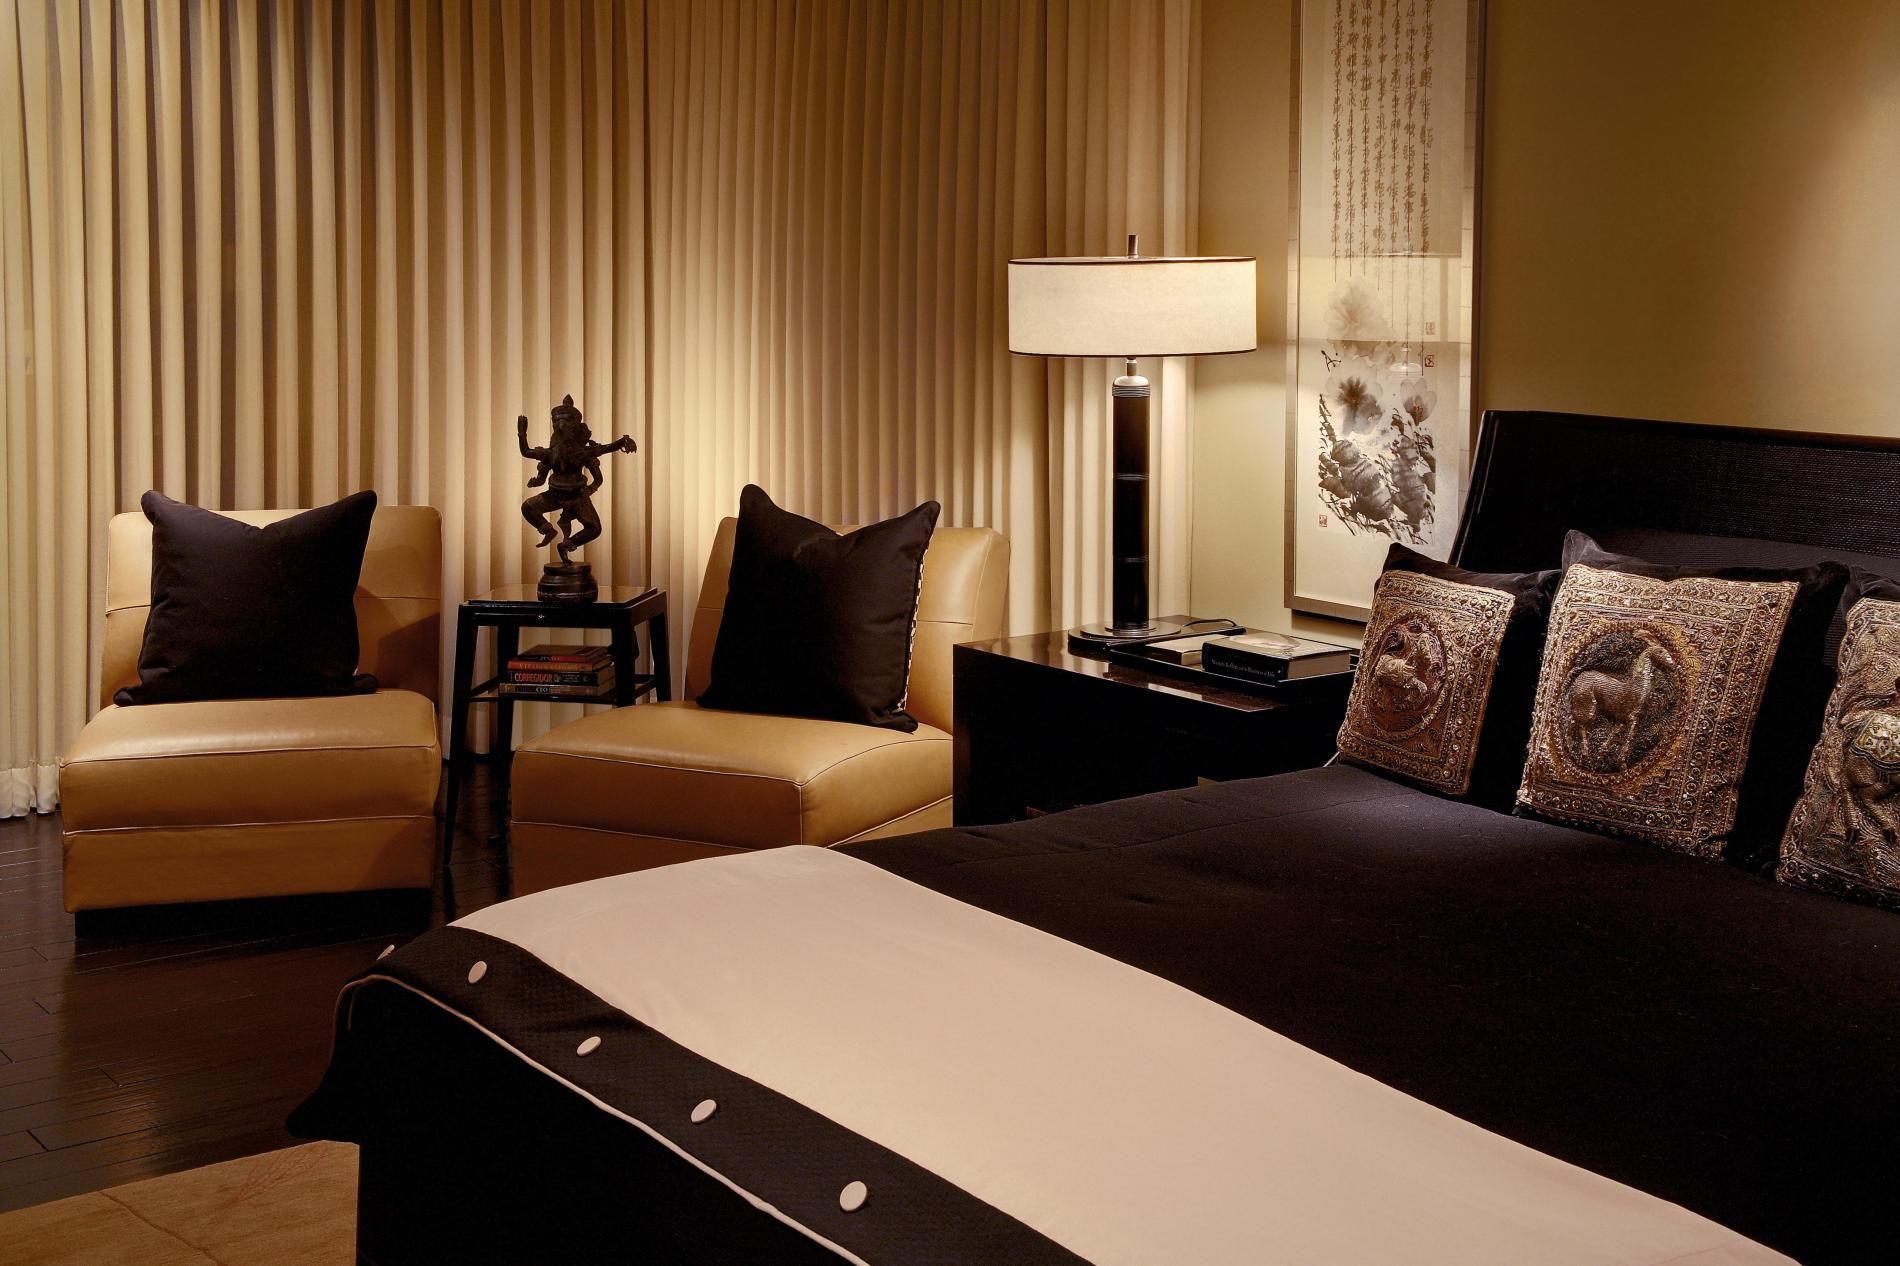 Blue and brown bedroom decor - Interesting Bedroom Expansive Black Bedroom Furniture Ideas Carpet Area Rugs Bright Bedroom Lighting Natural With Brown Bedroom